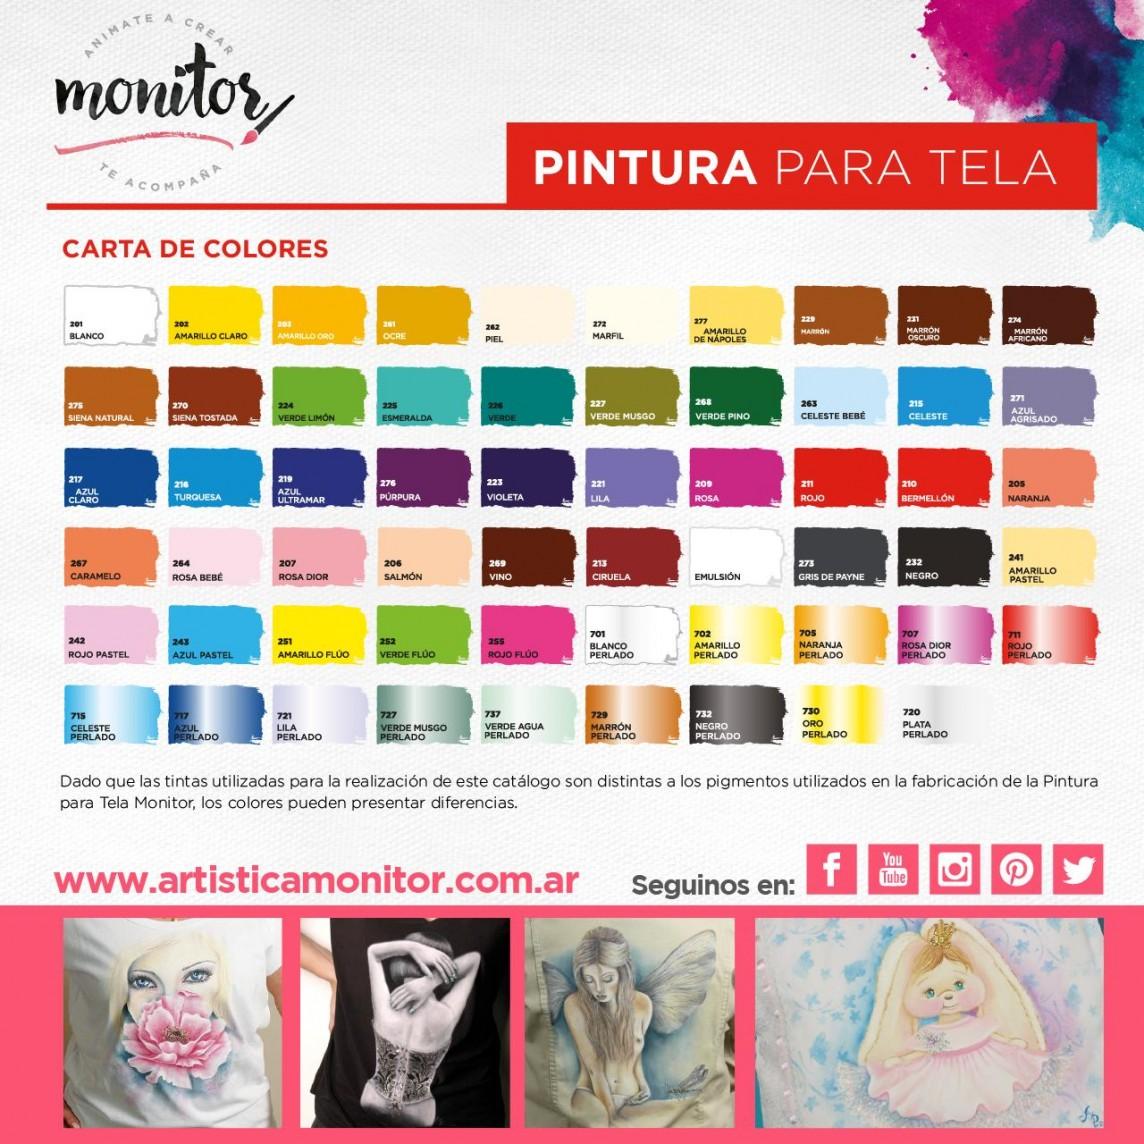 Carta de colores para Pintura para Tela